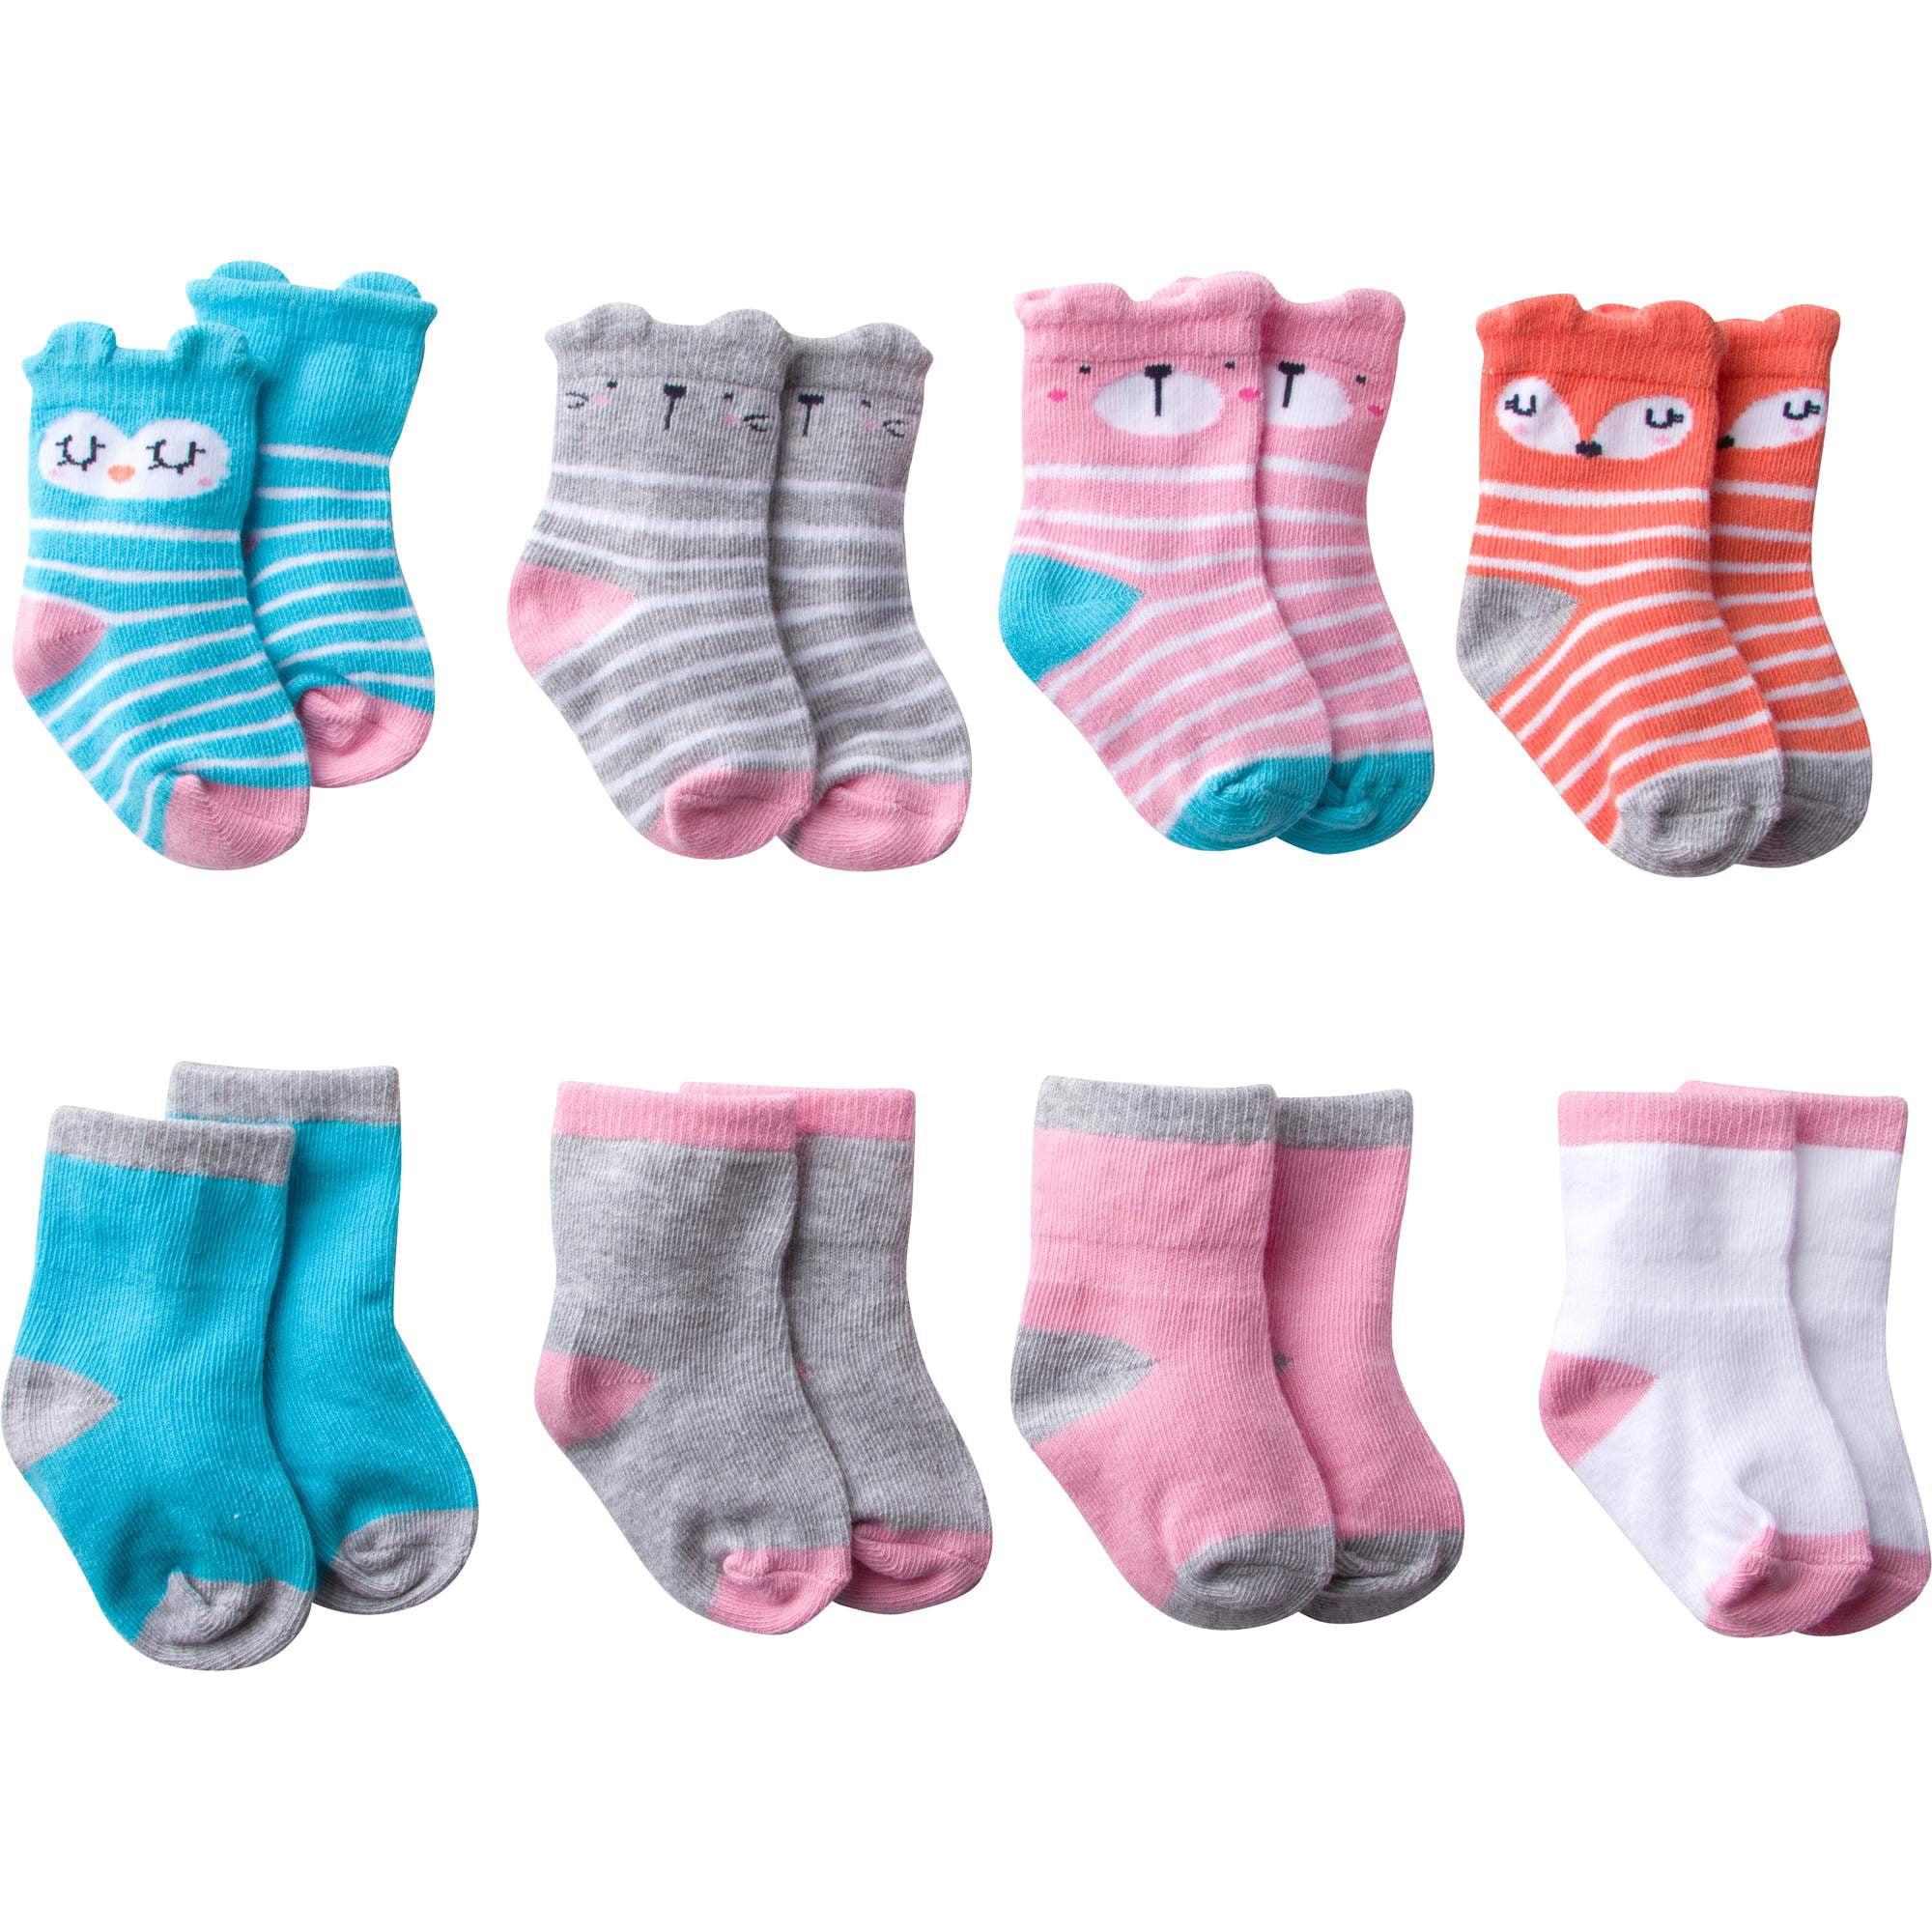 socks 6-12 Months old 3 Piece Set Girl New Pink Camo Baby Bib Moccasins